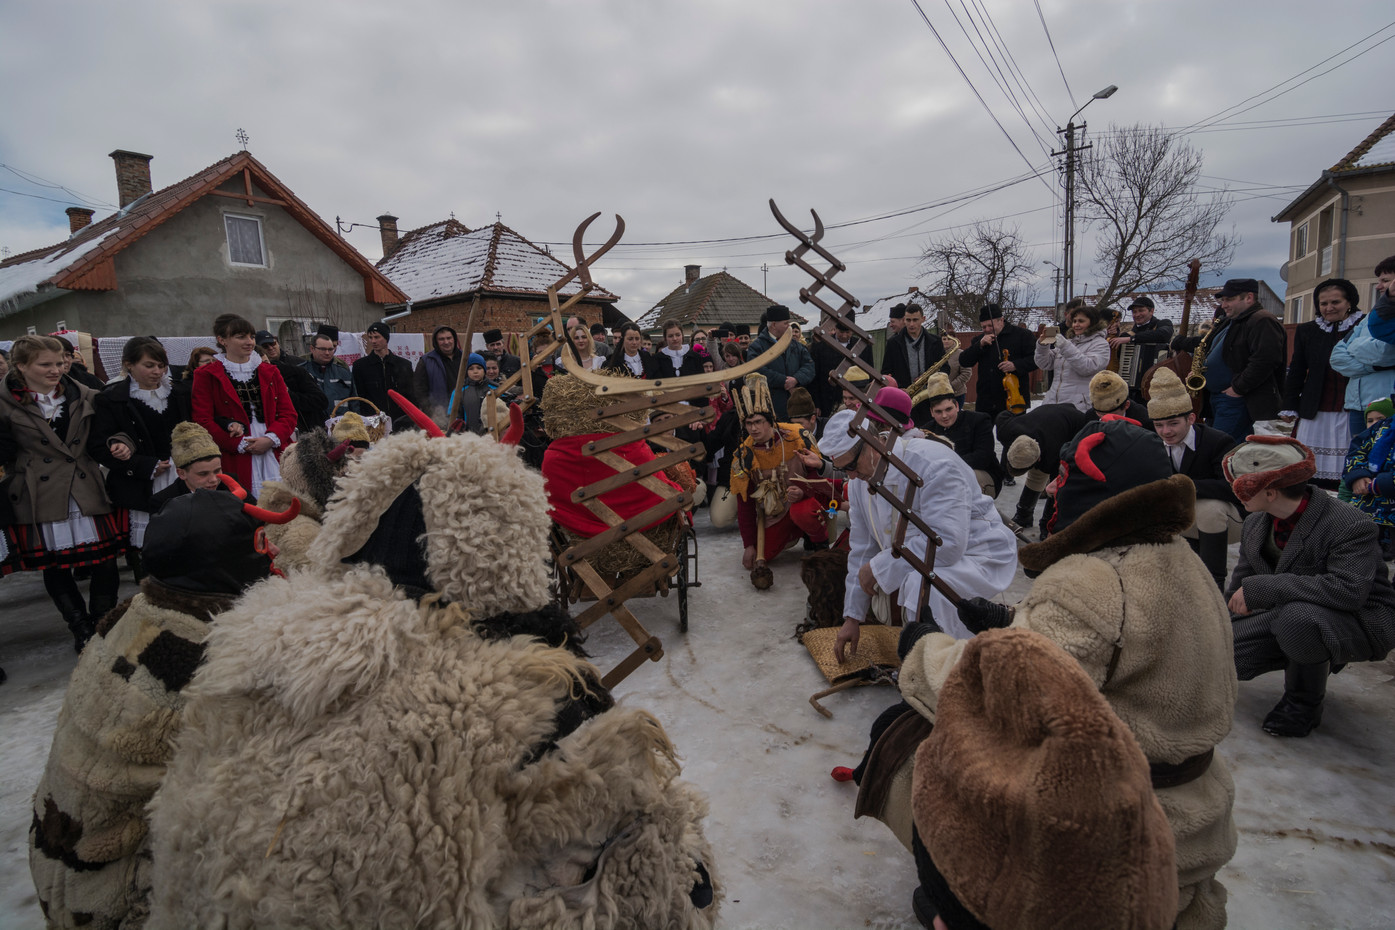 Csíkszentsimon / Sânsimion Harghita county / Hargita megye / Județul Harghita Romania / Románia / România 2018